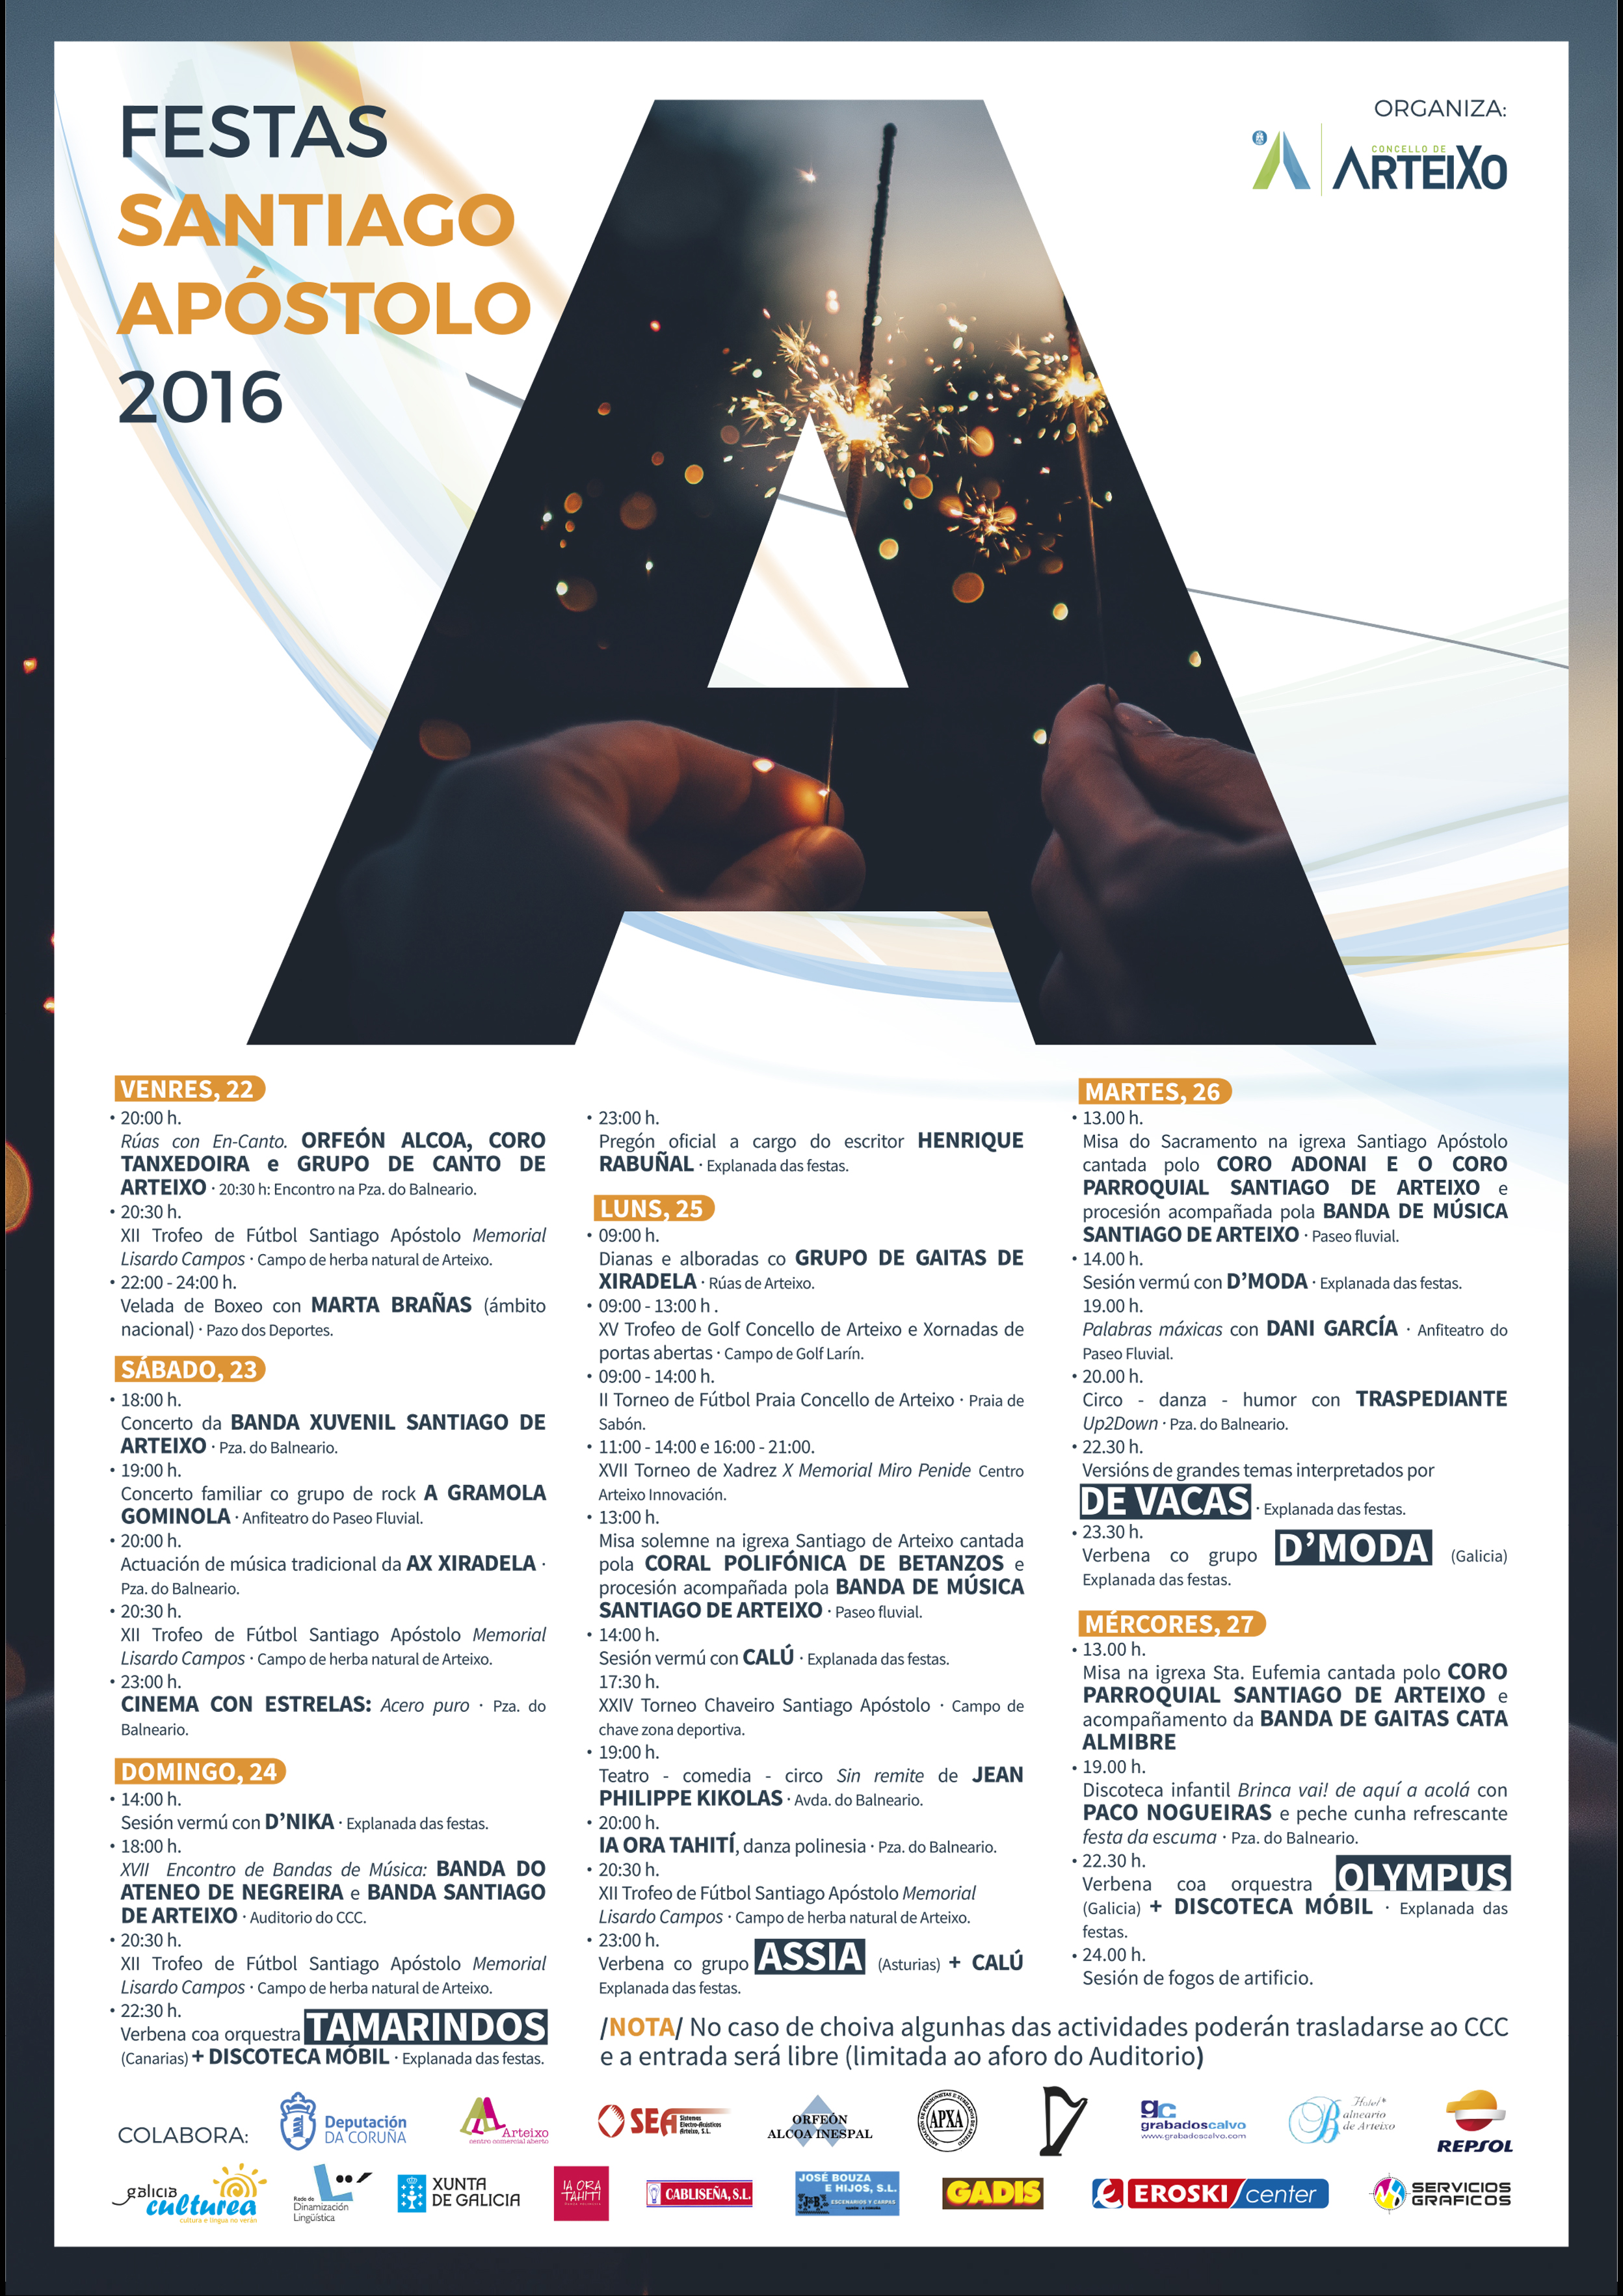 Cartel-Festas-Santiago-Apostolo-2016